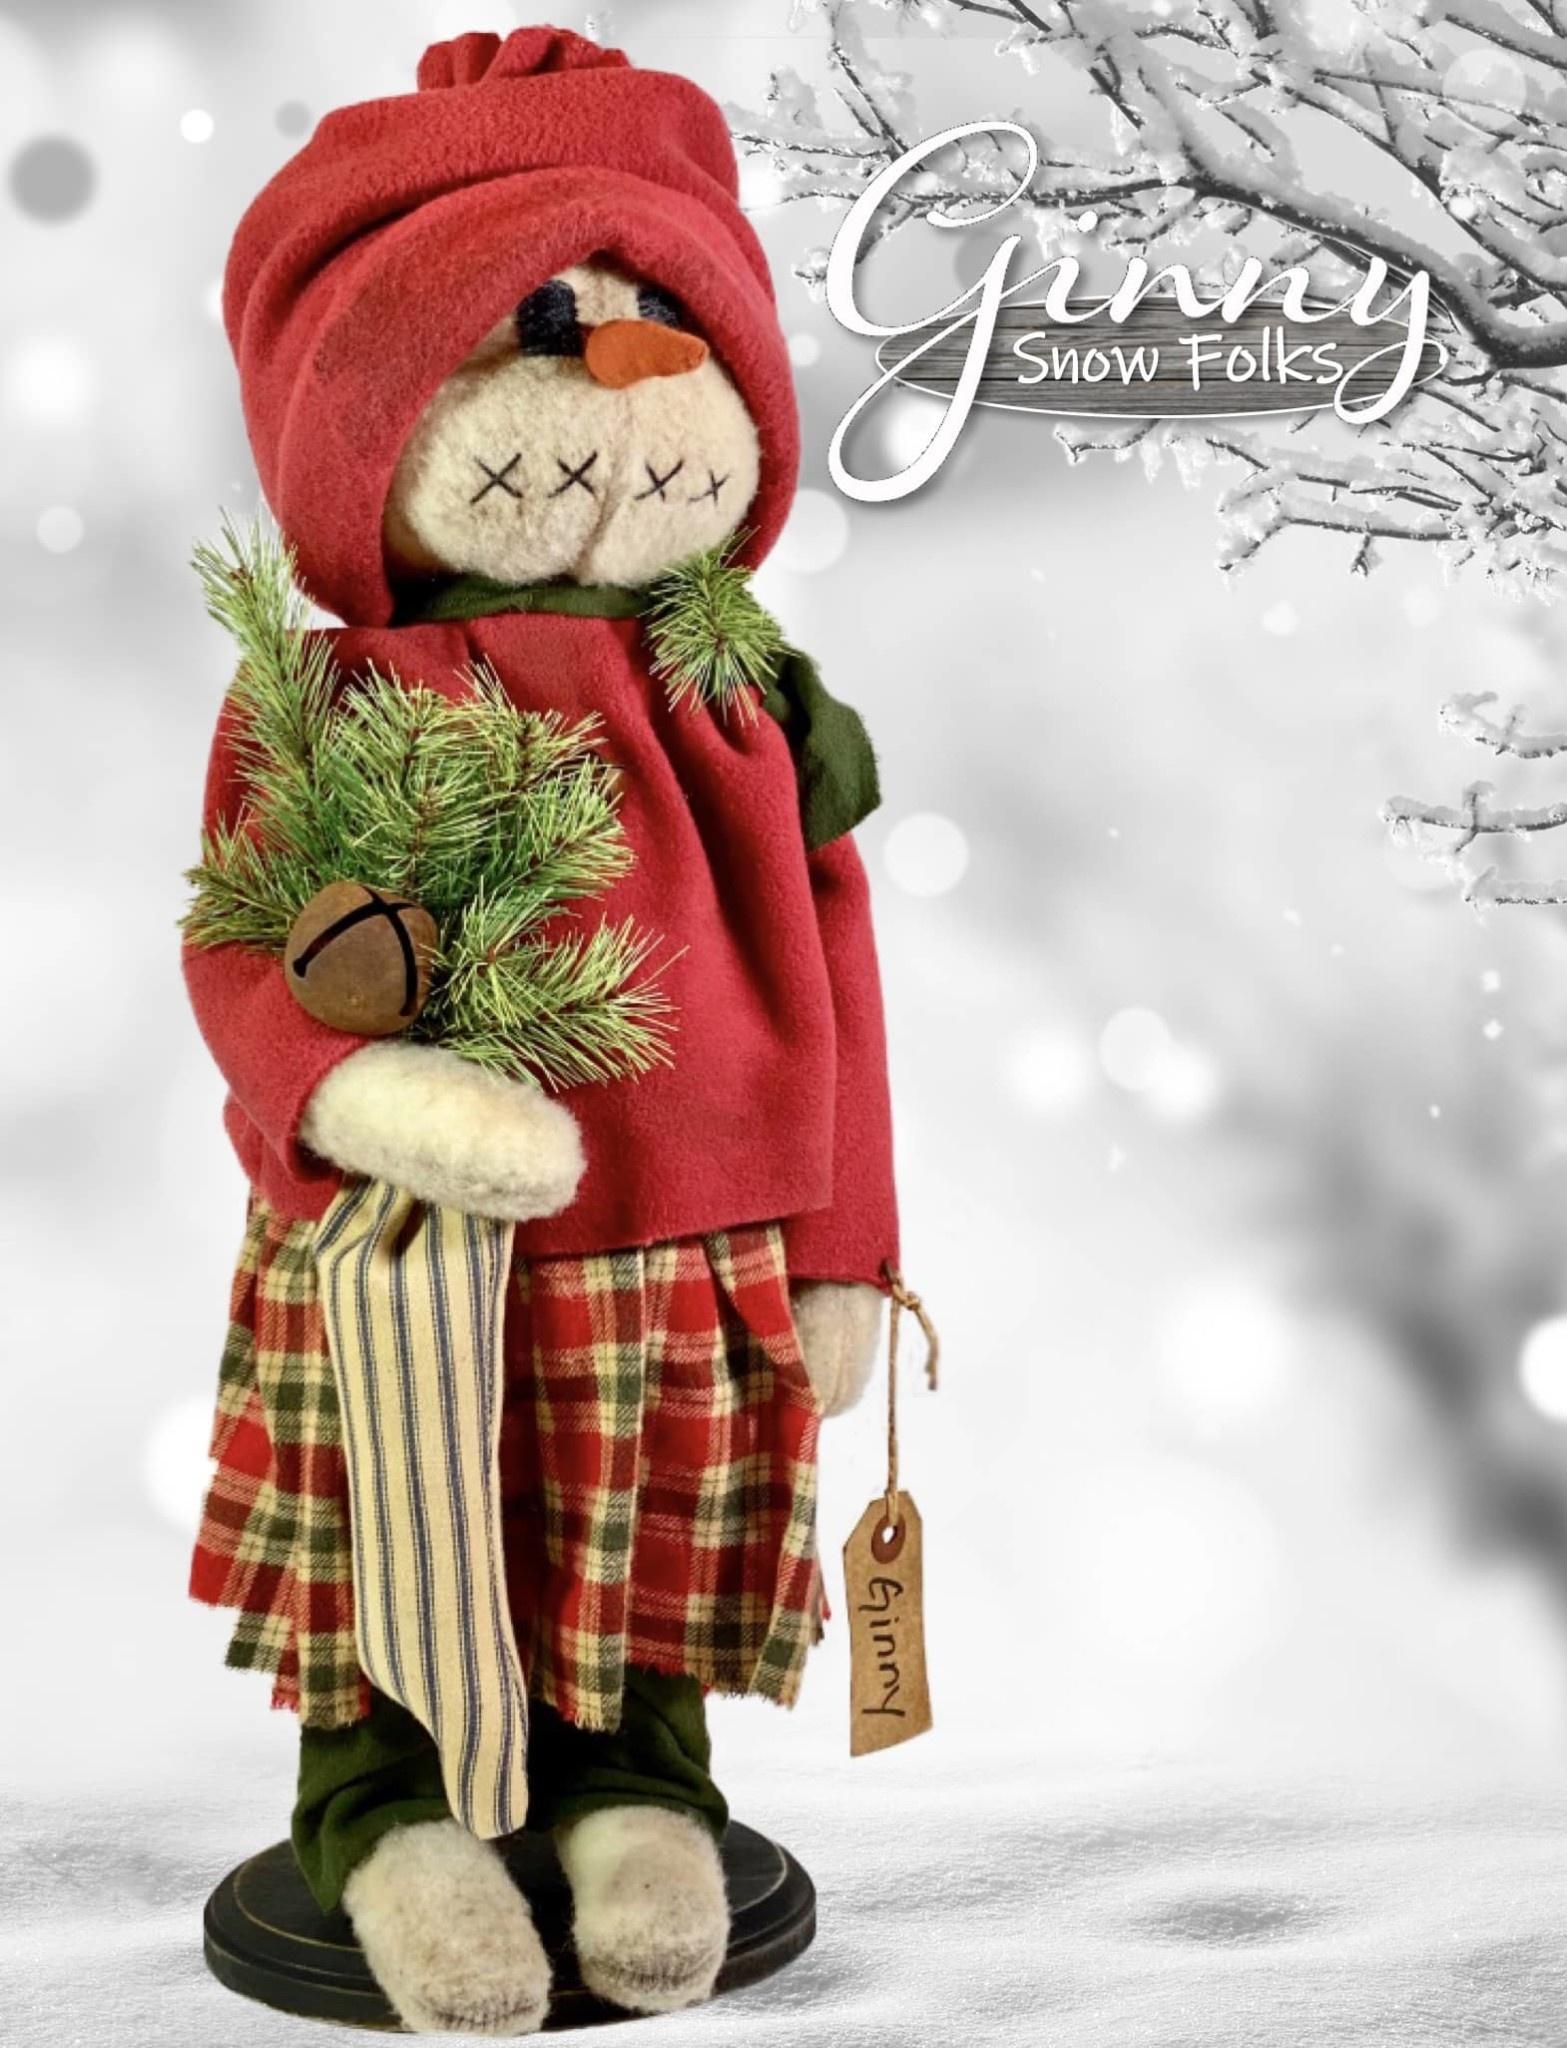 Nana's Farmhouse Ginny Snow Girl Holding Ticking Stripe Stocking with Bell